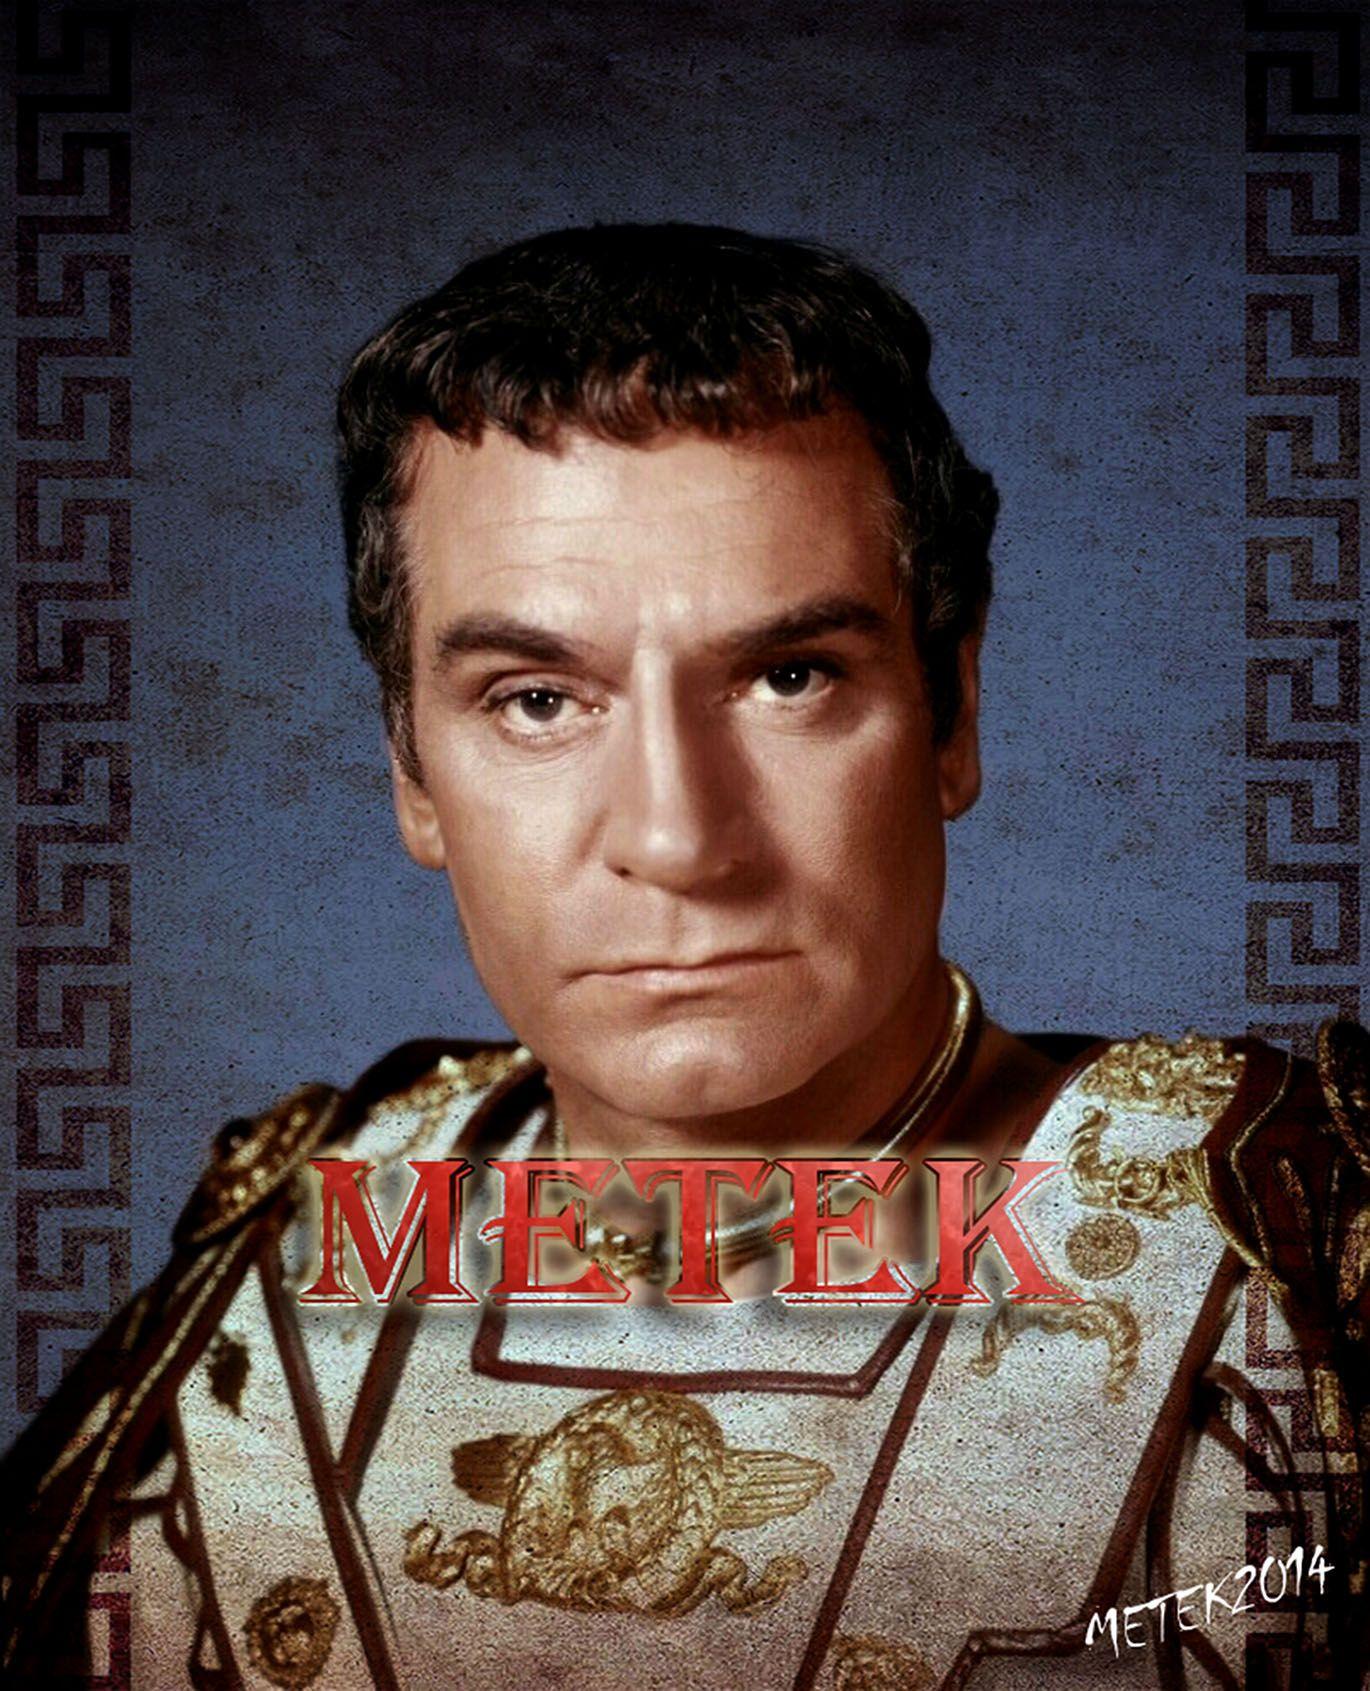 Laurence olivier spartacus quotes - Spartacus Spartacus 1960 Laurence Olivier